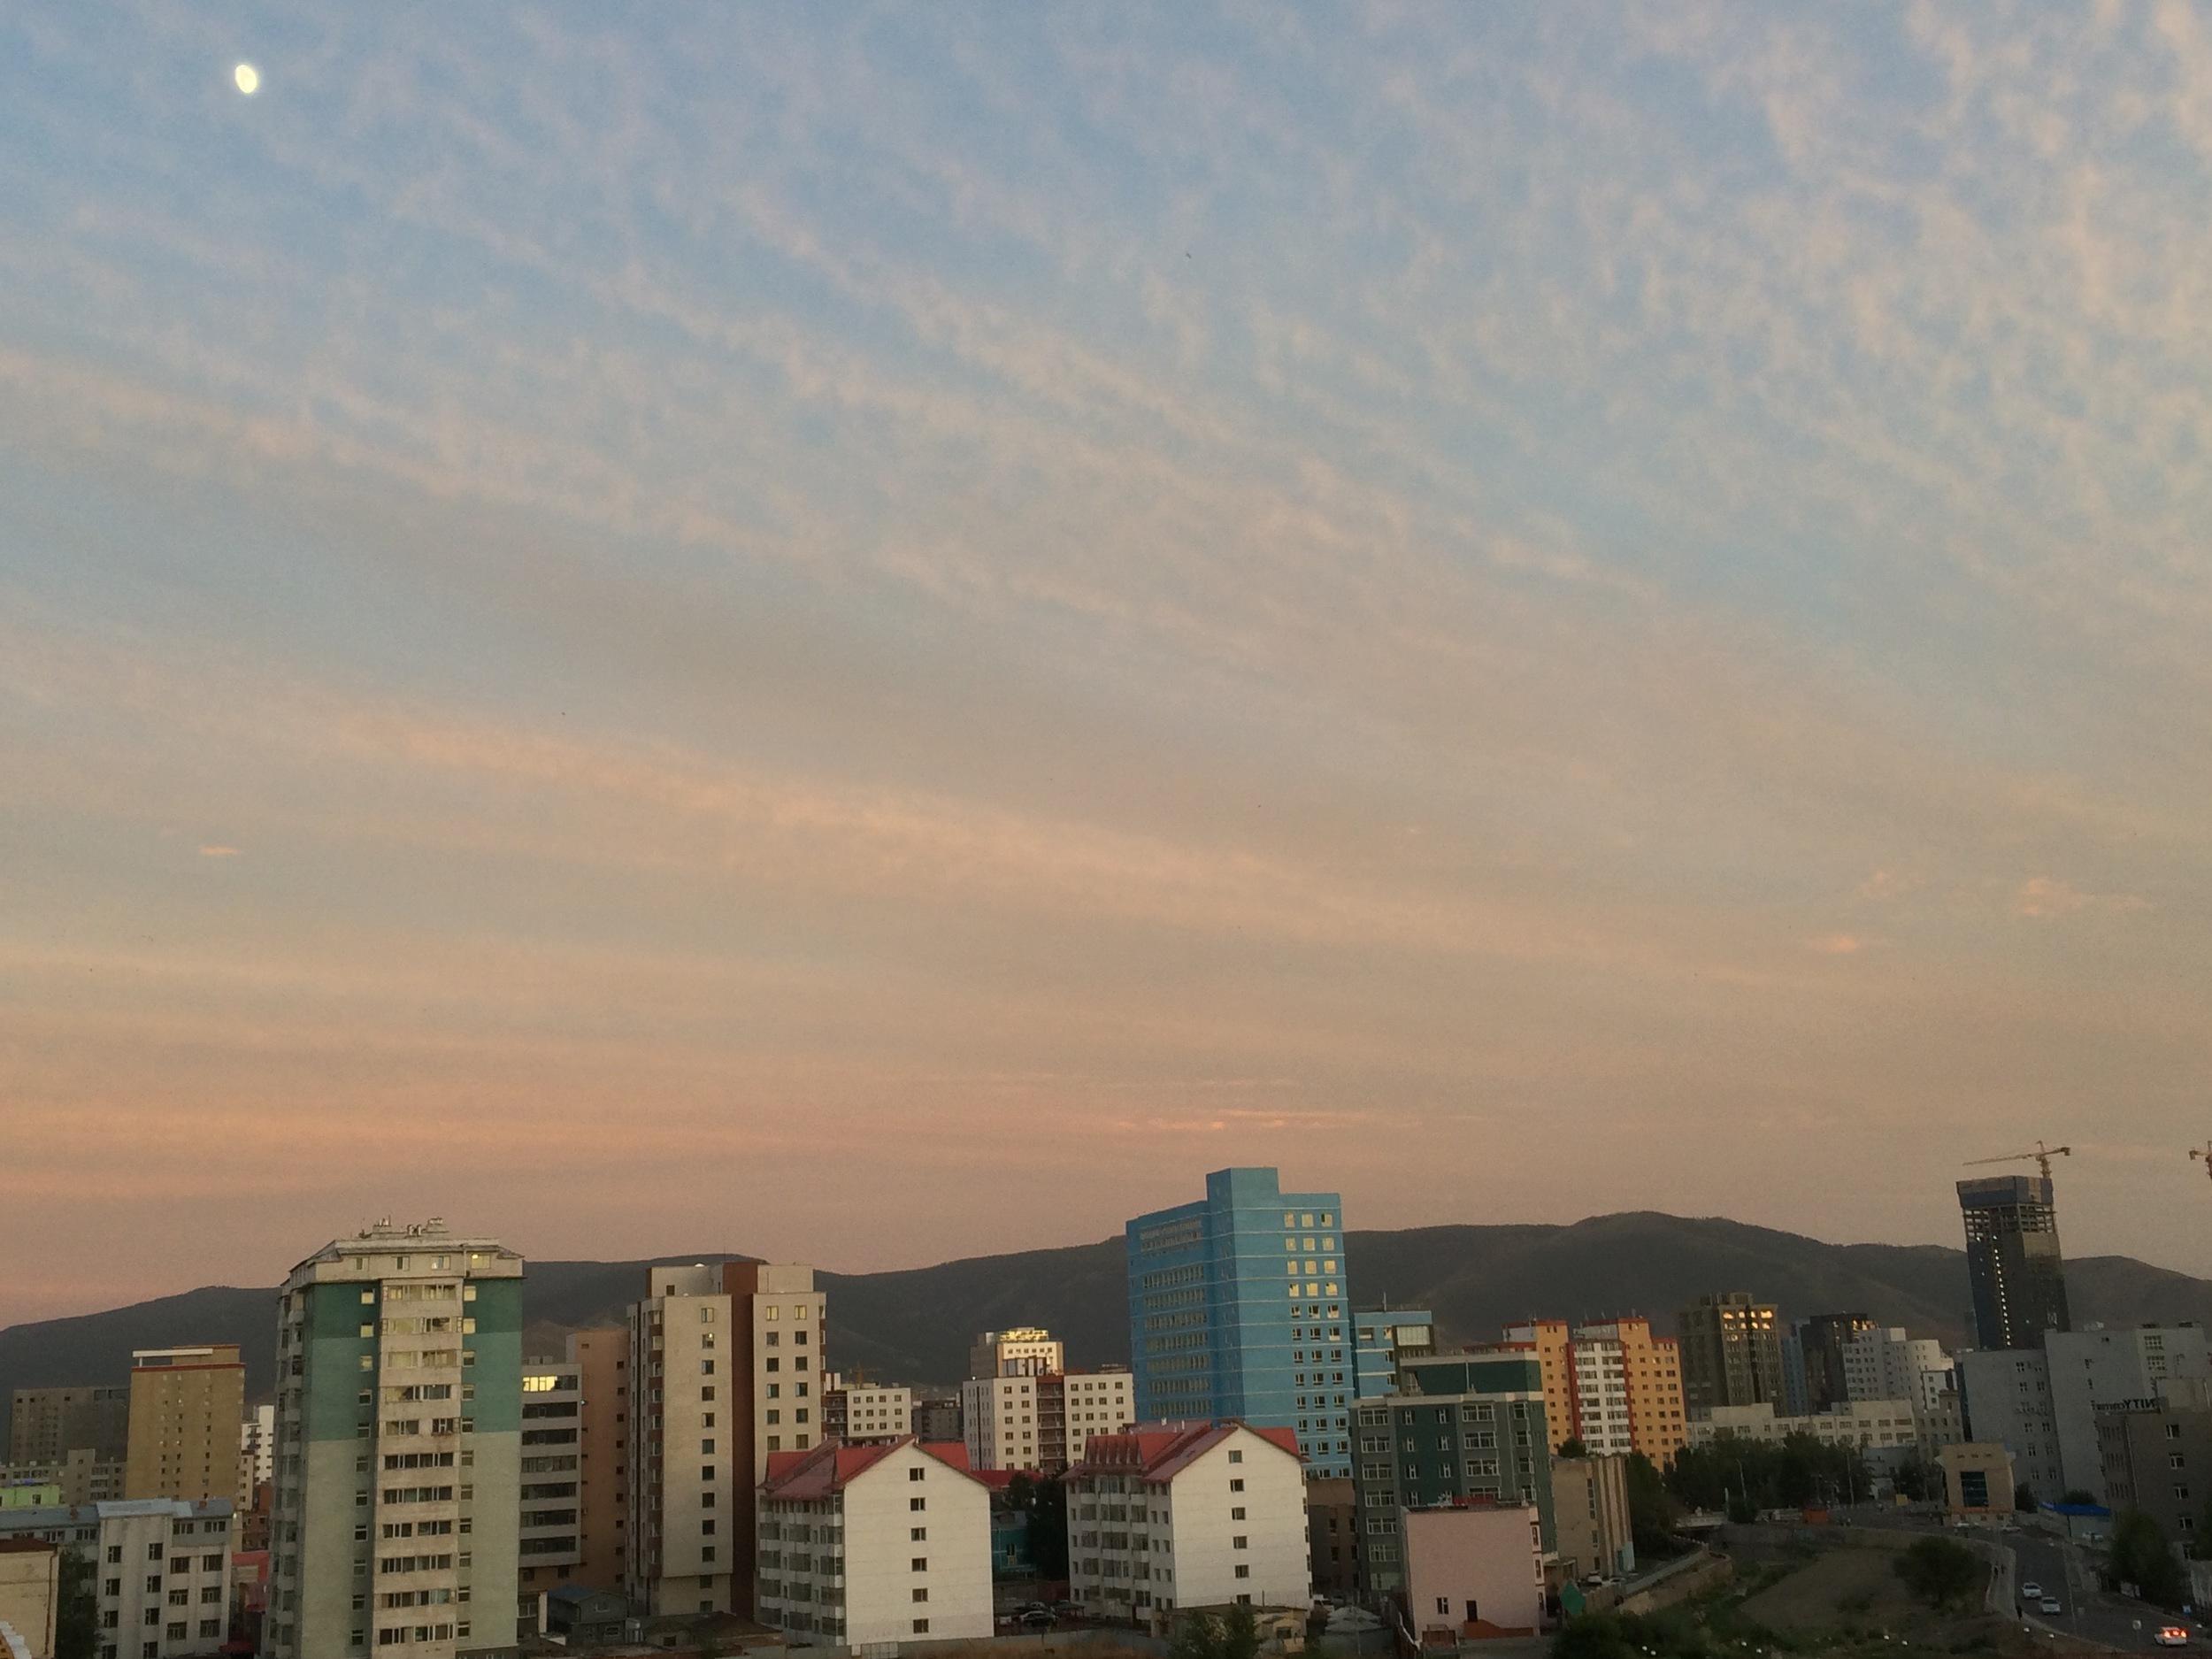 UlaanBaatar at dusk - picture taken at 10:15PM